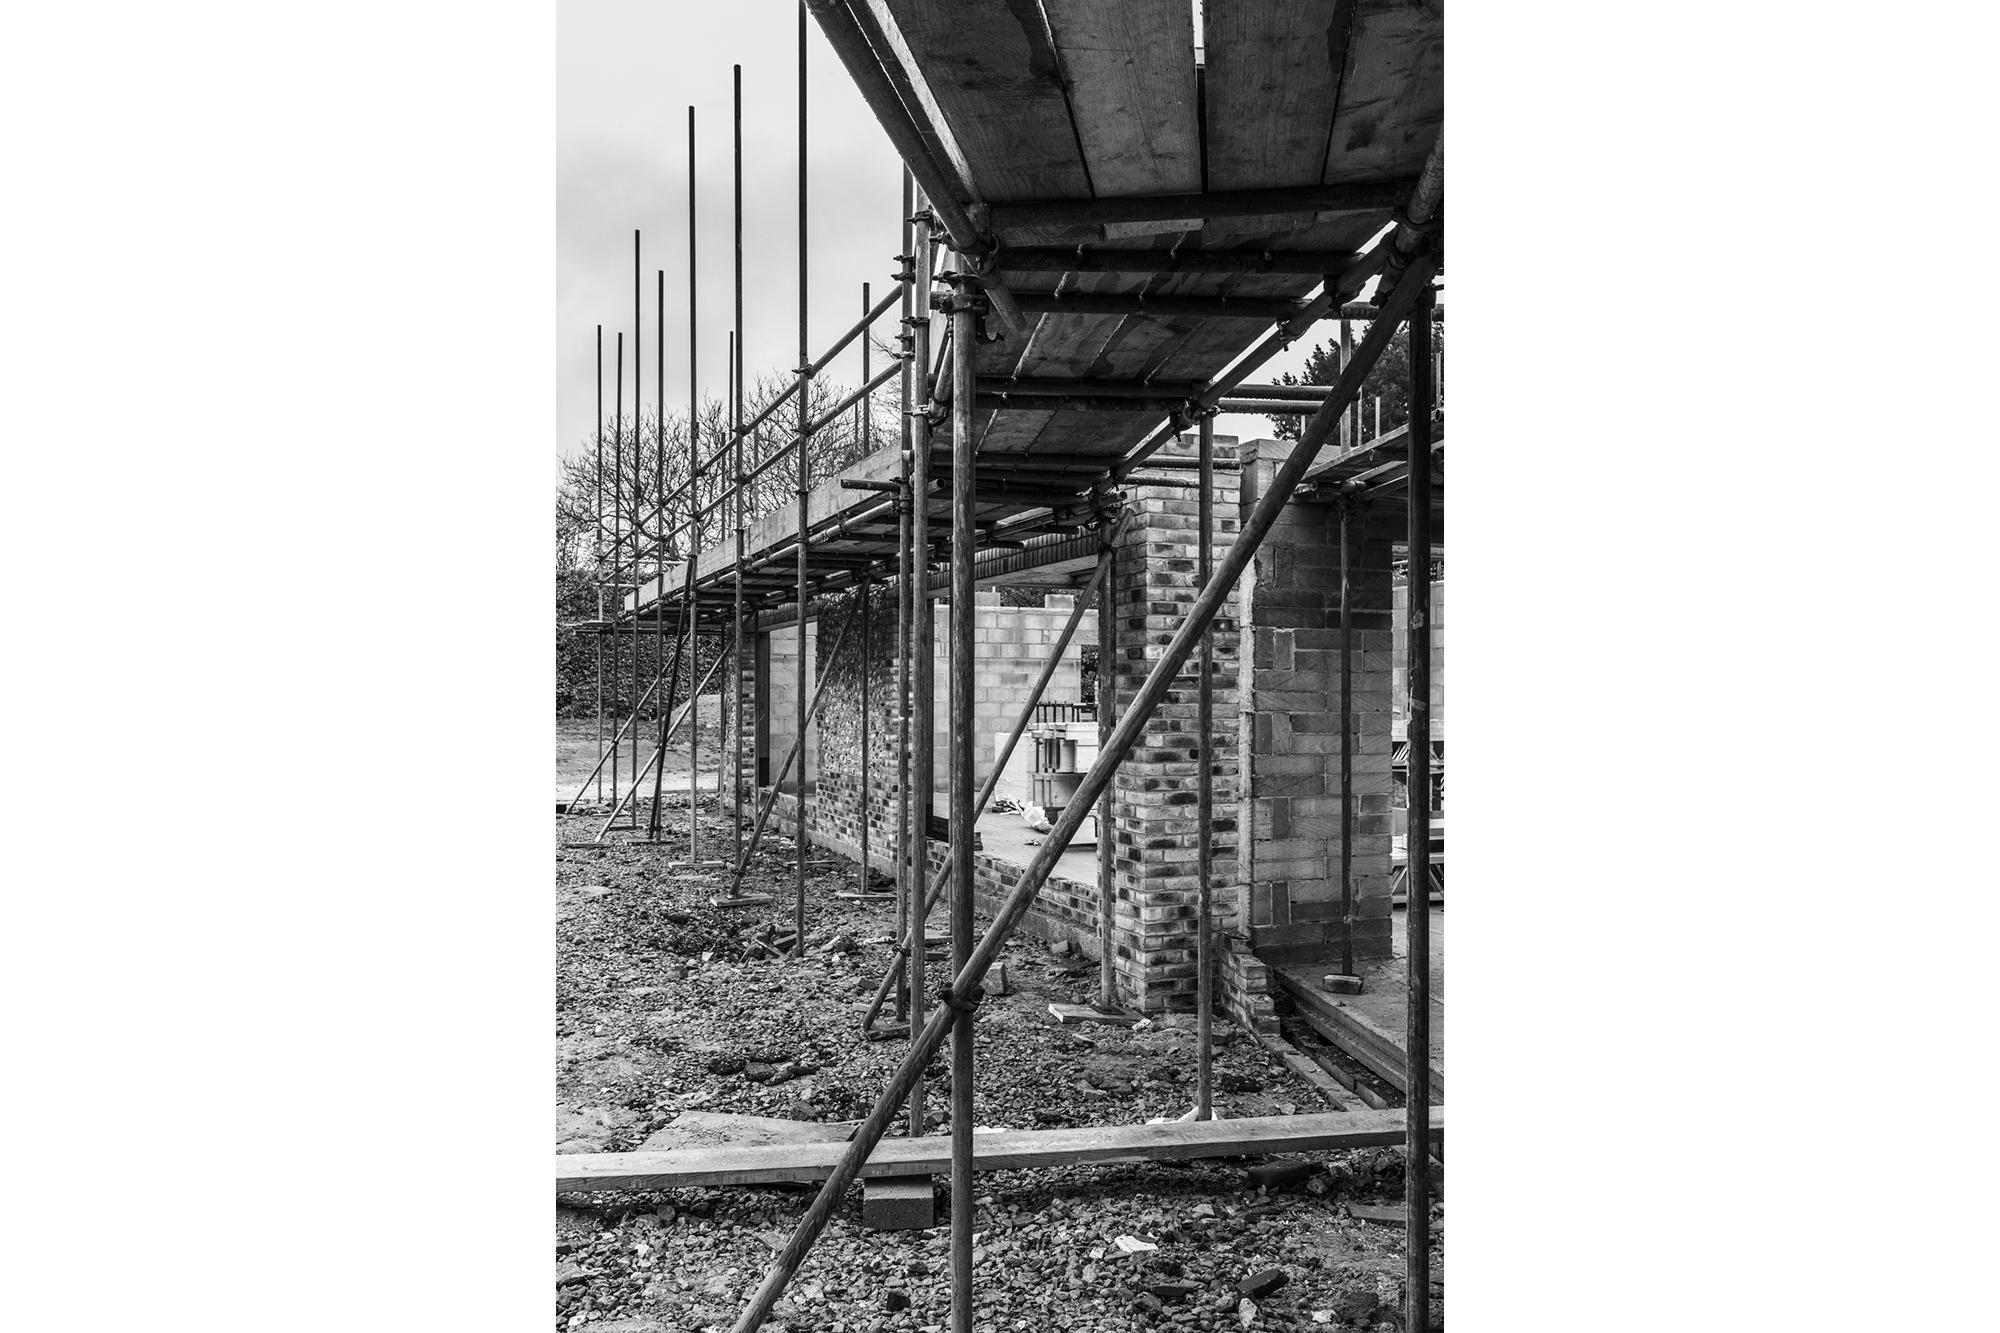 FlinthurstHouse_Construction_16.jpg